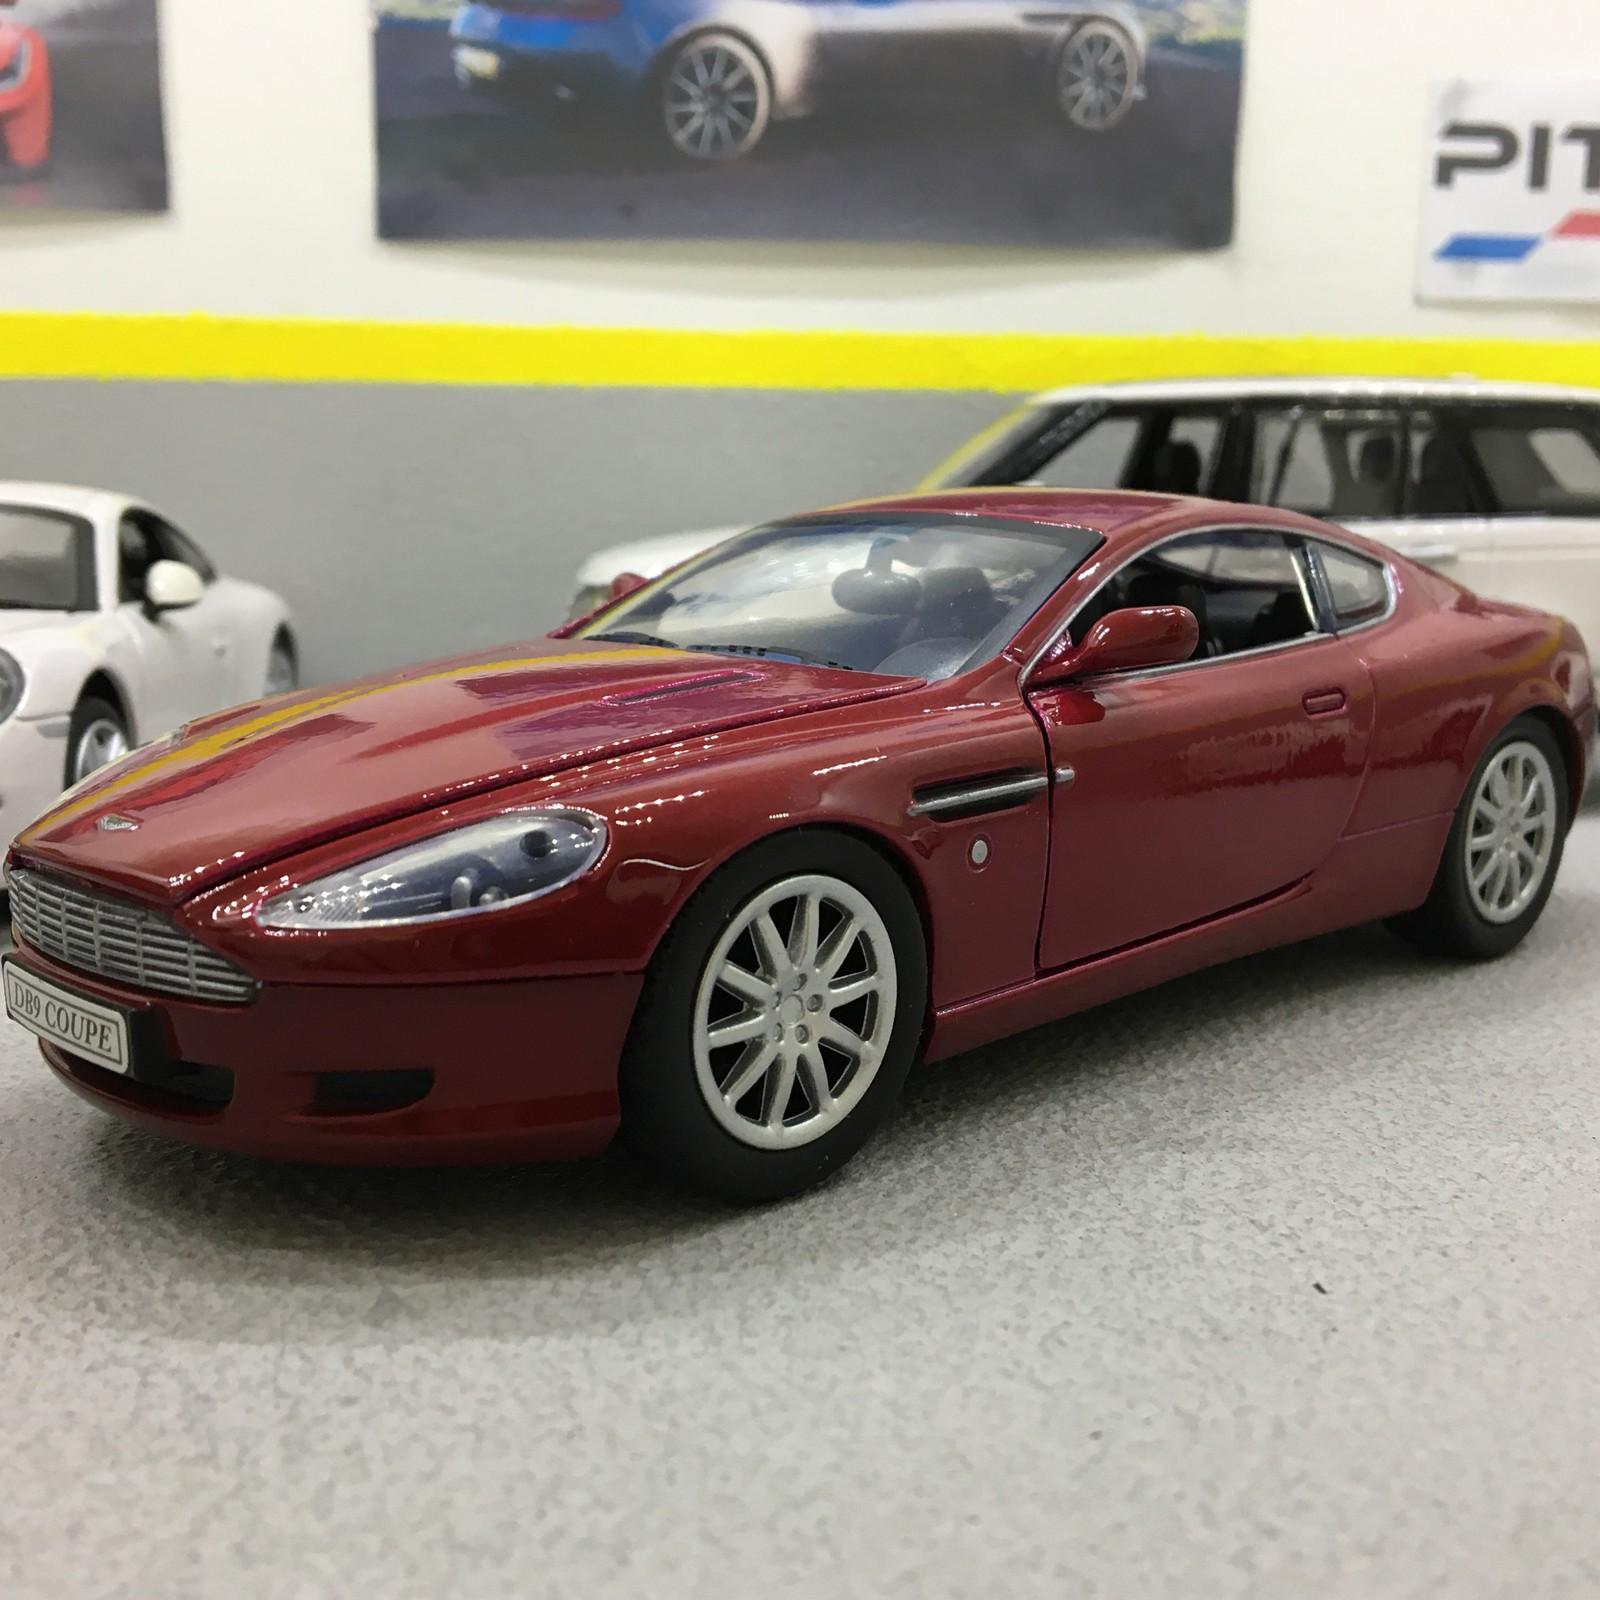 Aston Martin DB Coupe Magna Red Scale DieCast Model Car - 2007 aston martin db9